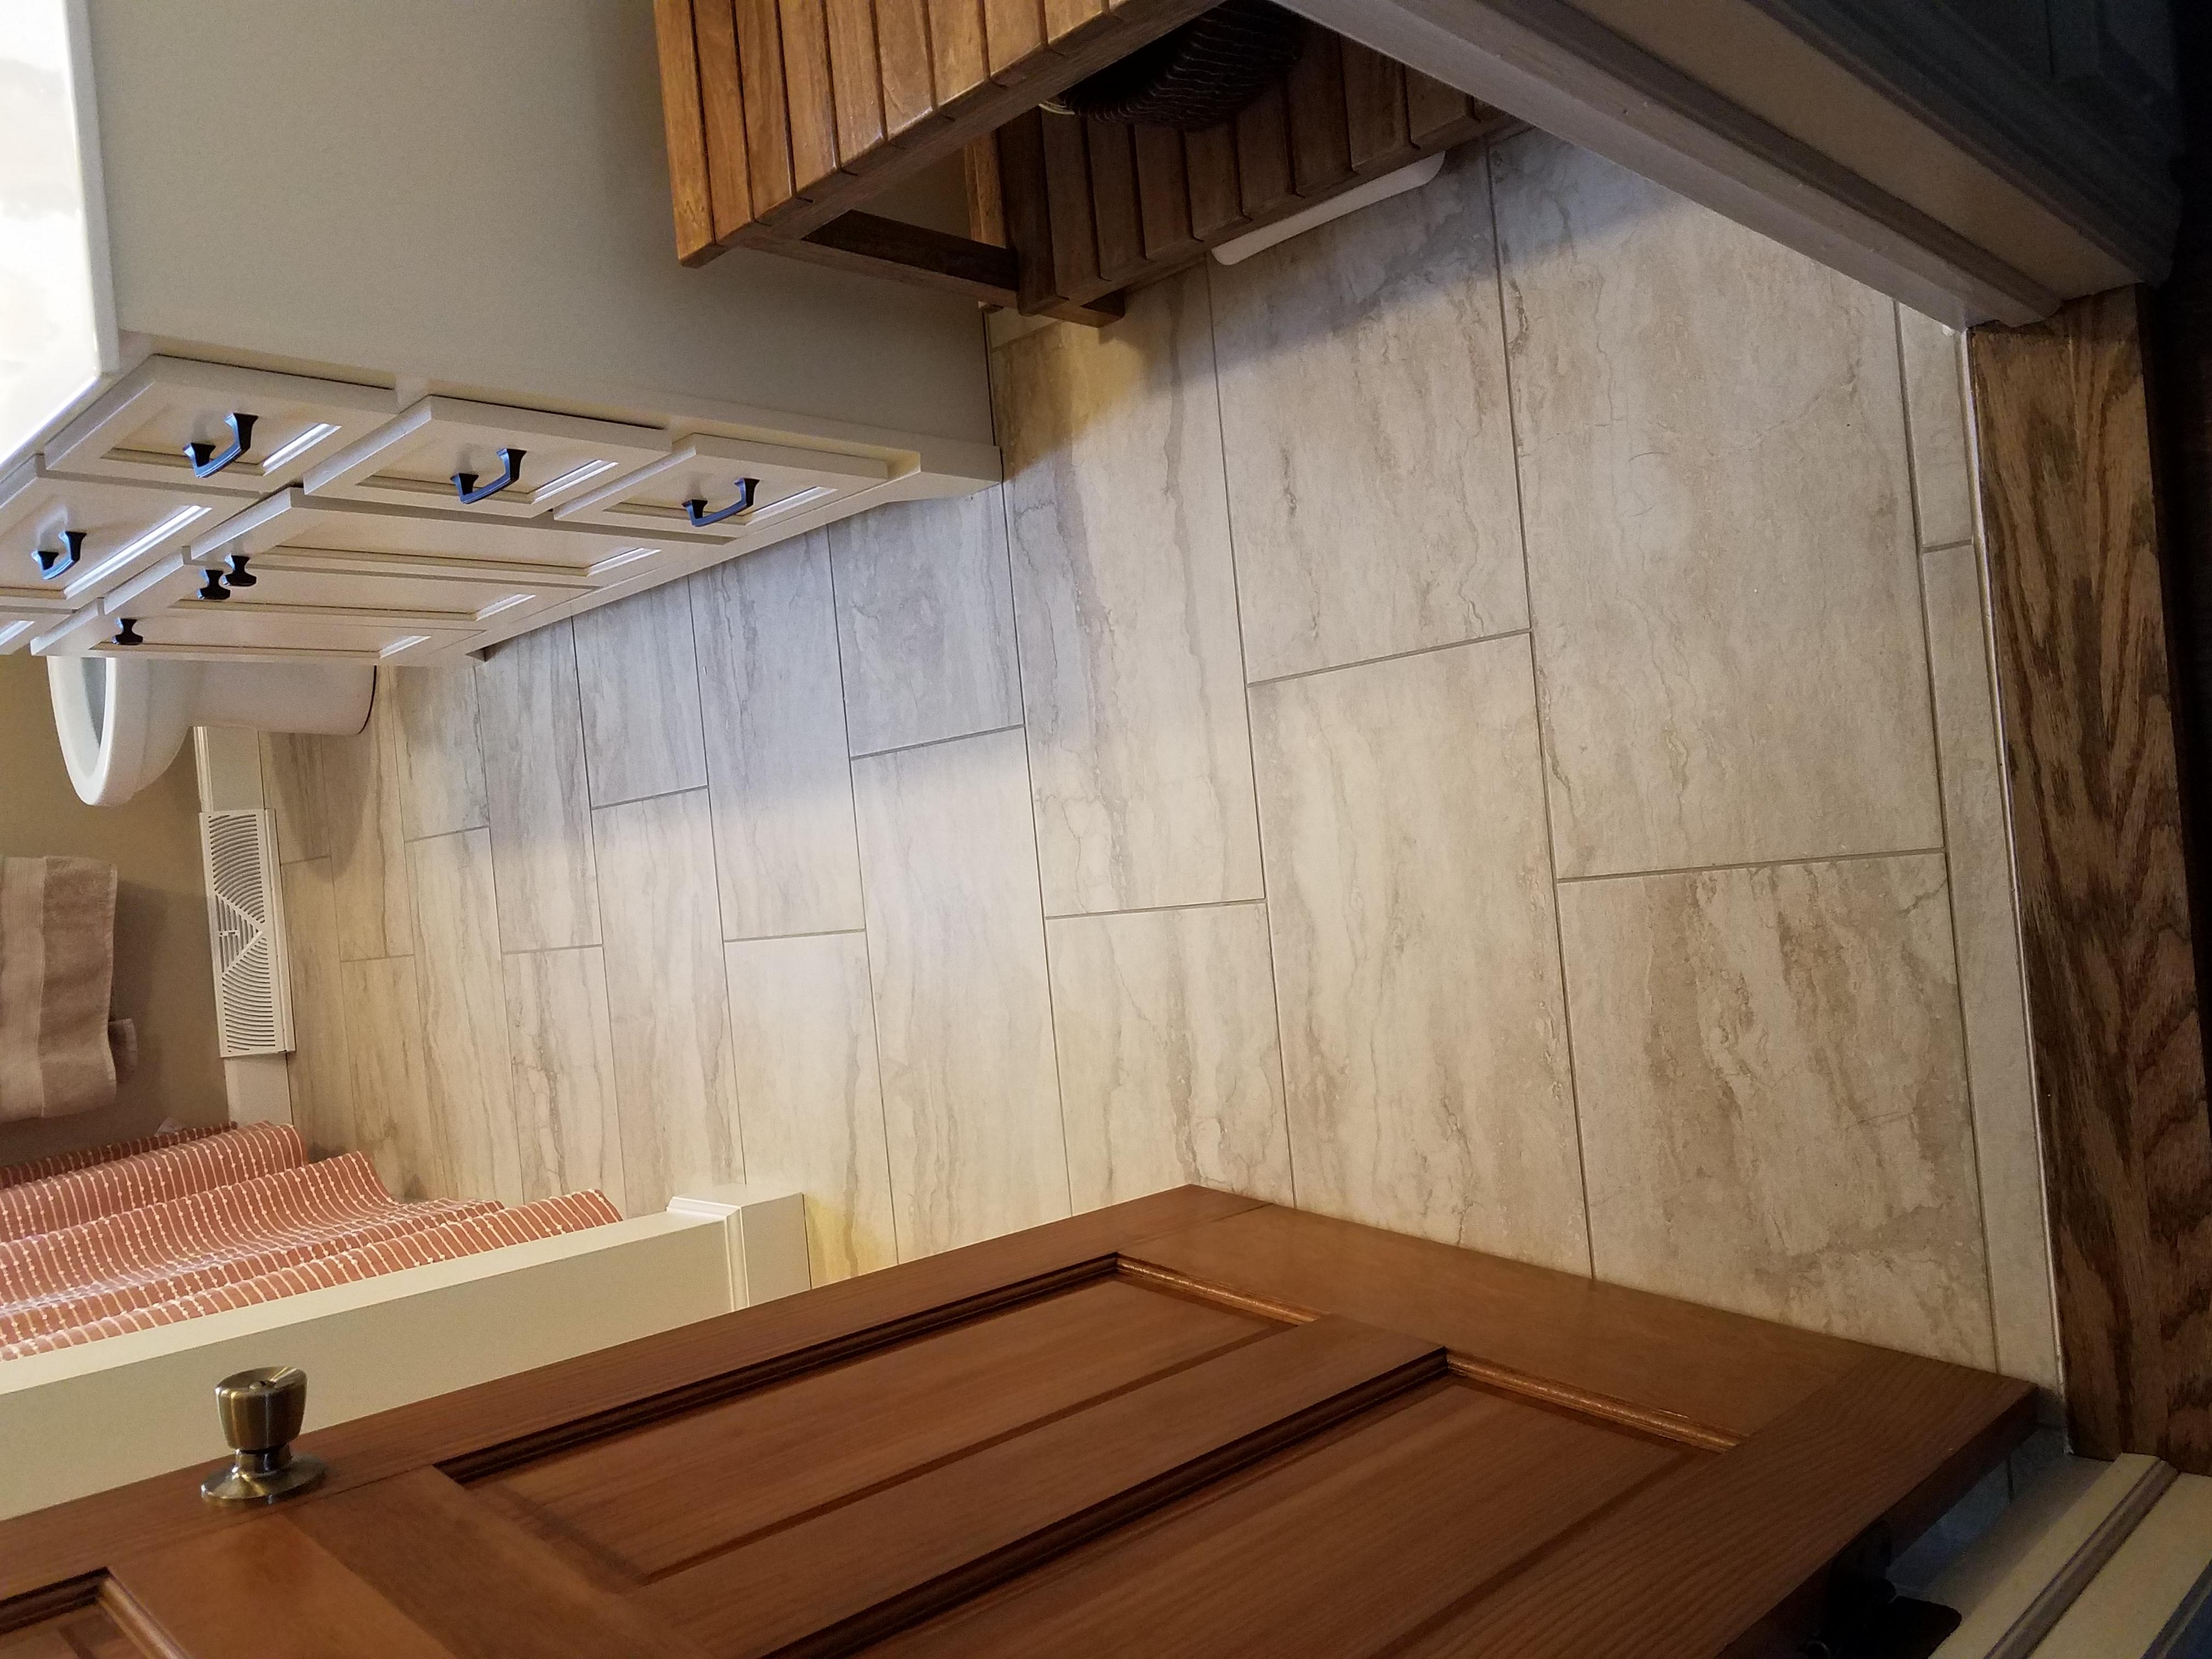 tile works reviews delanson ny